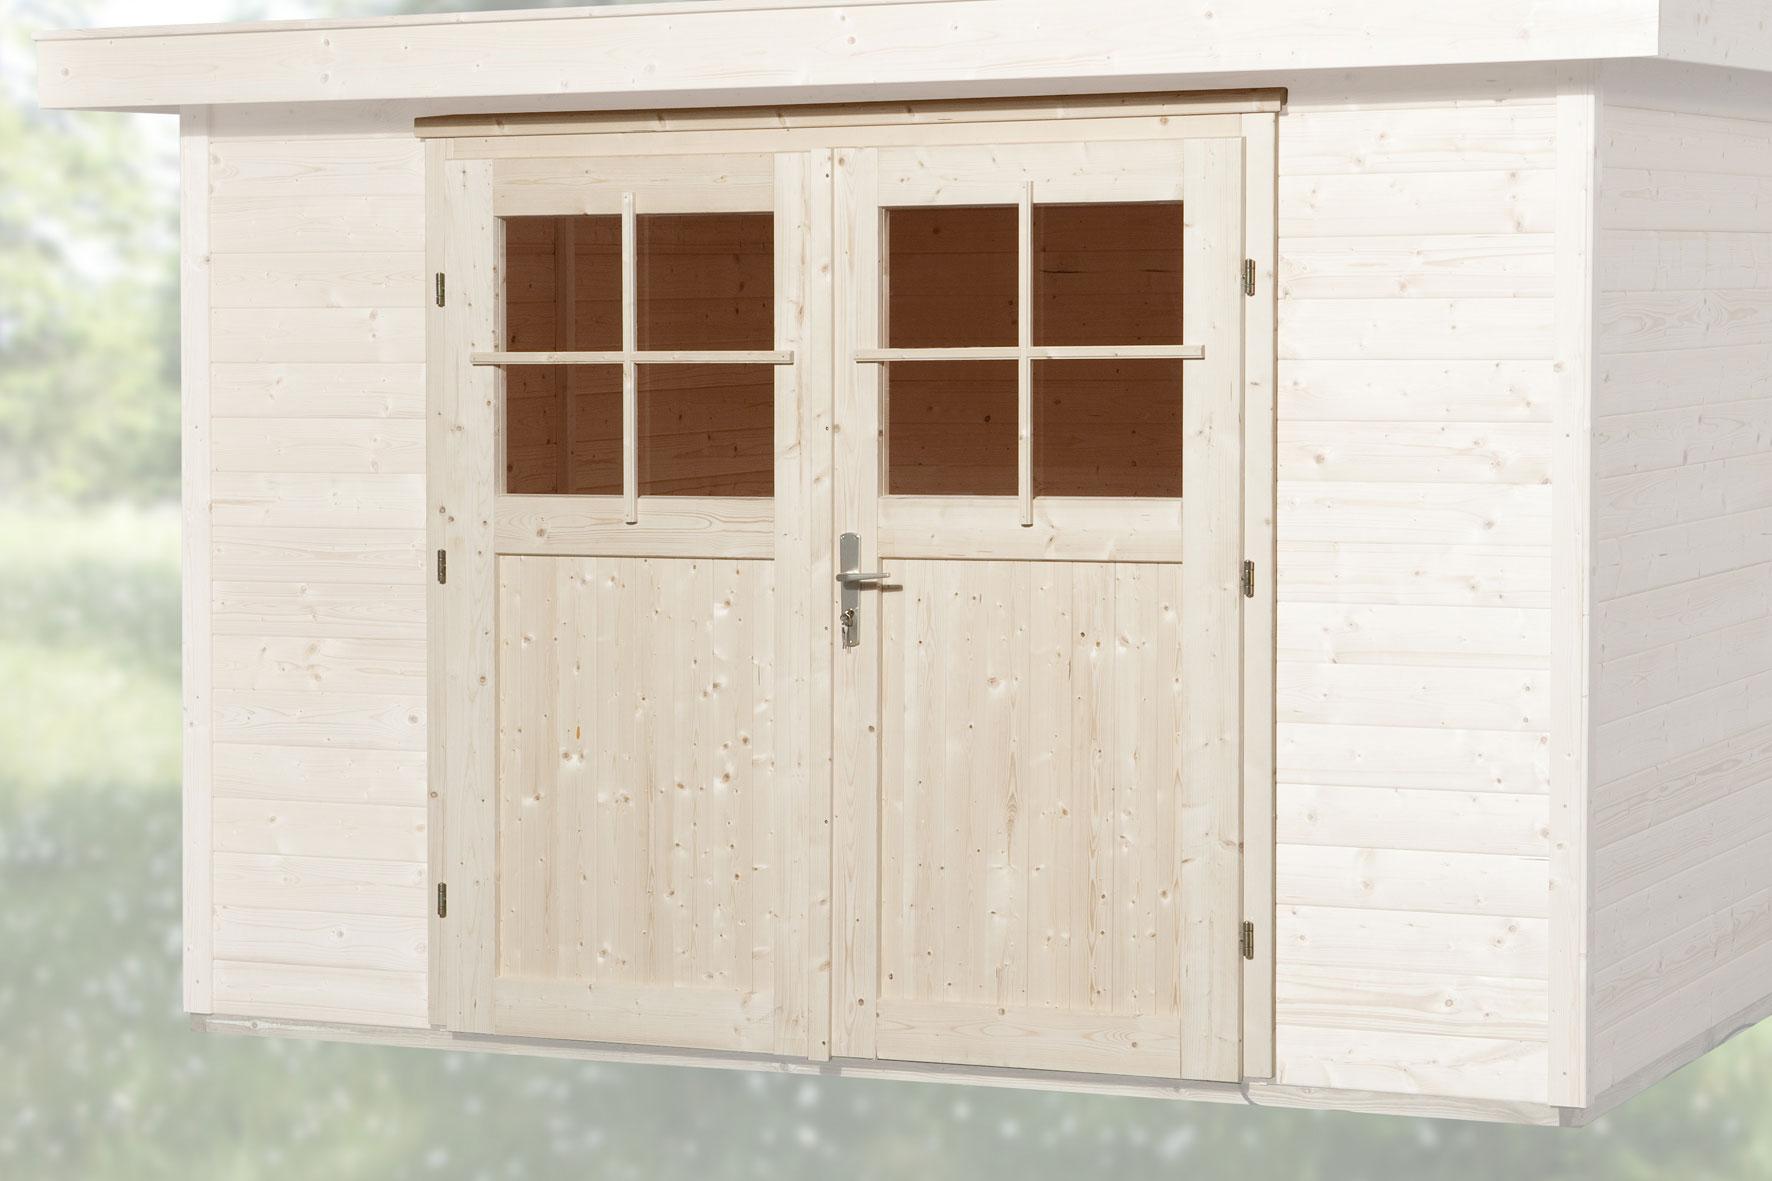 Gartenhaustür für Wandstärke 21 - 28 mm 182x181cm Bild 1